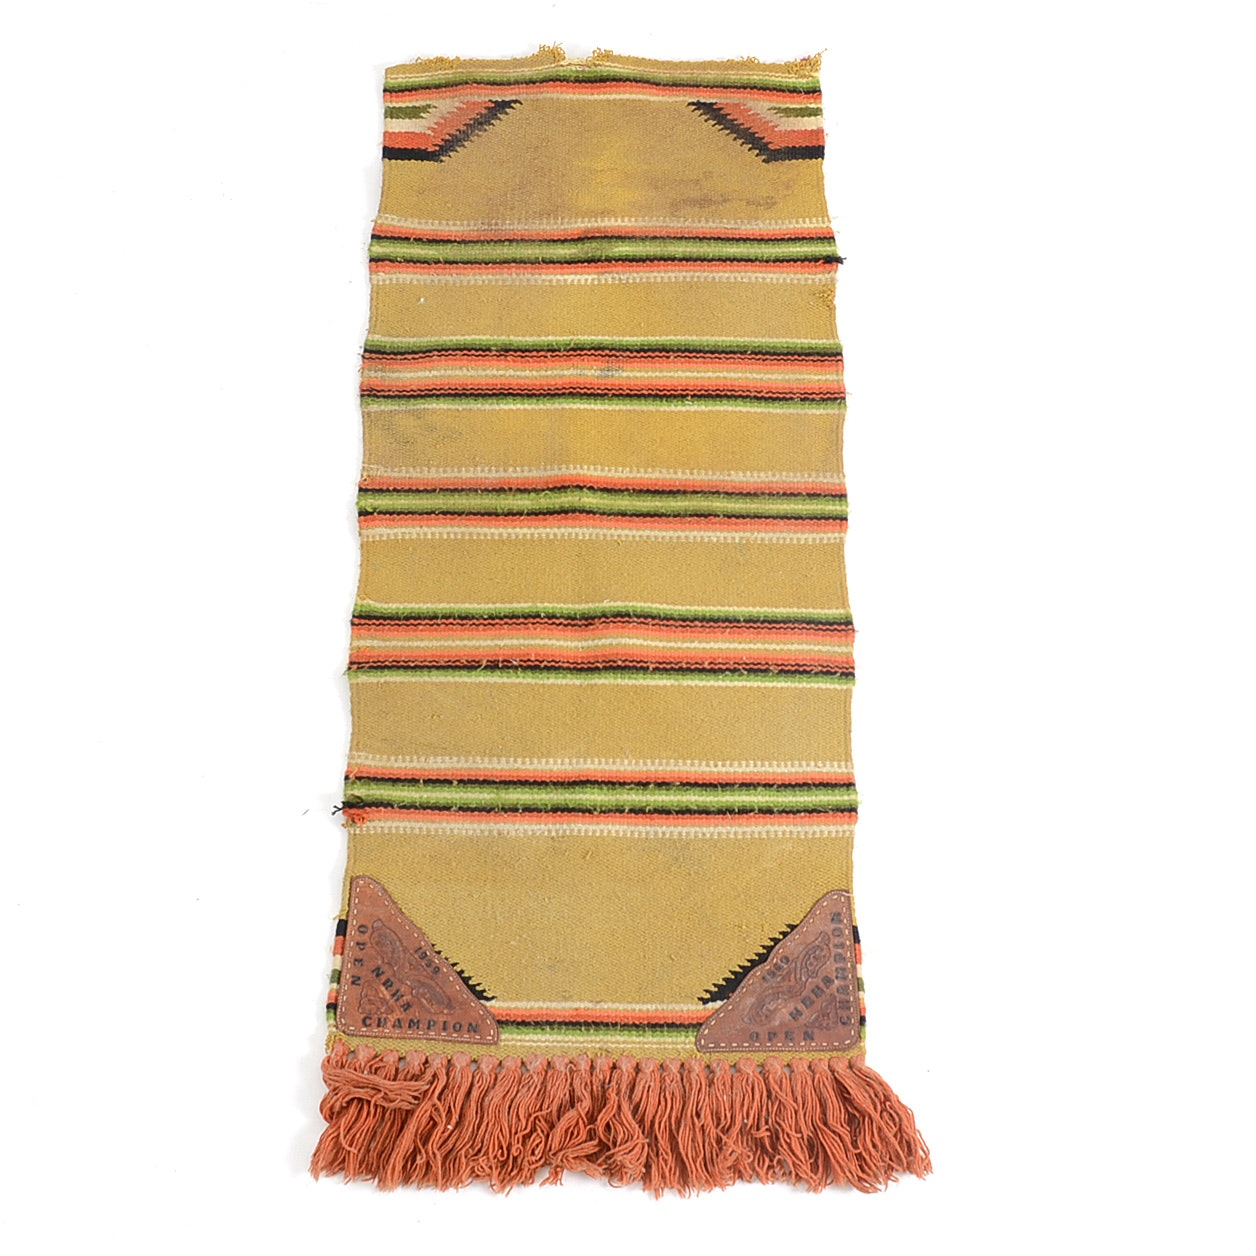 Churchill Weavers Hand Woven Wool Blanket Ebth